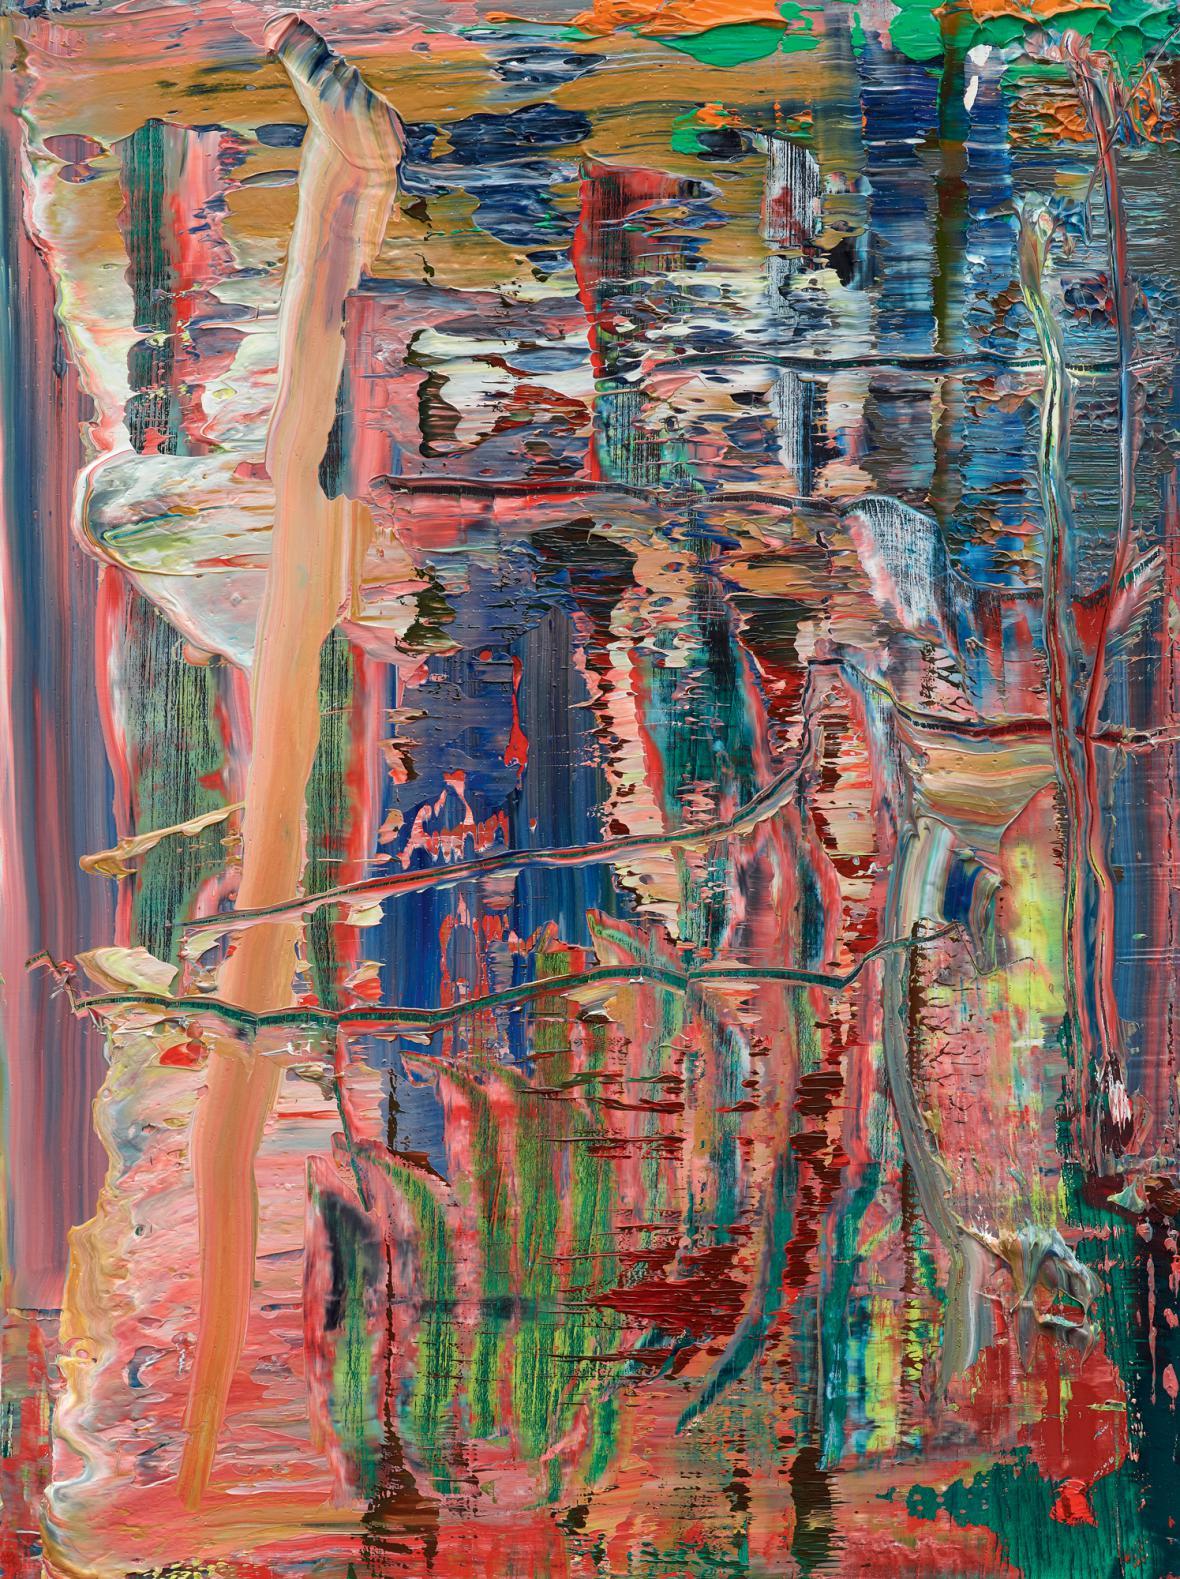 Gerhard Richter / Abstraktní obraz, 2016